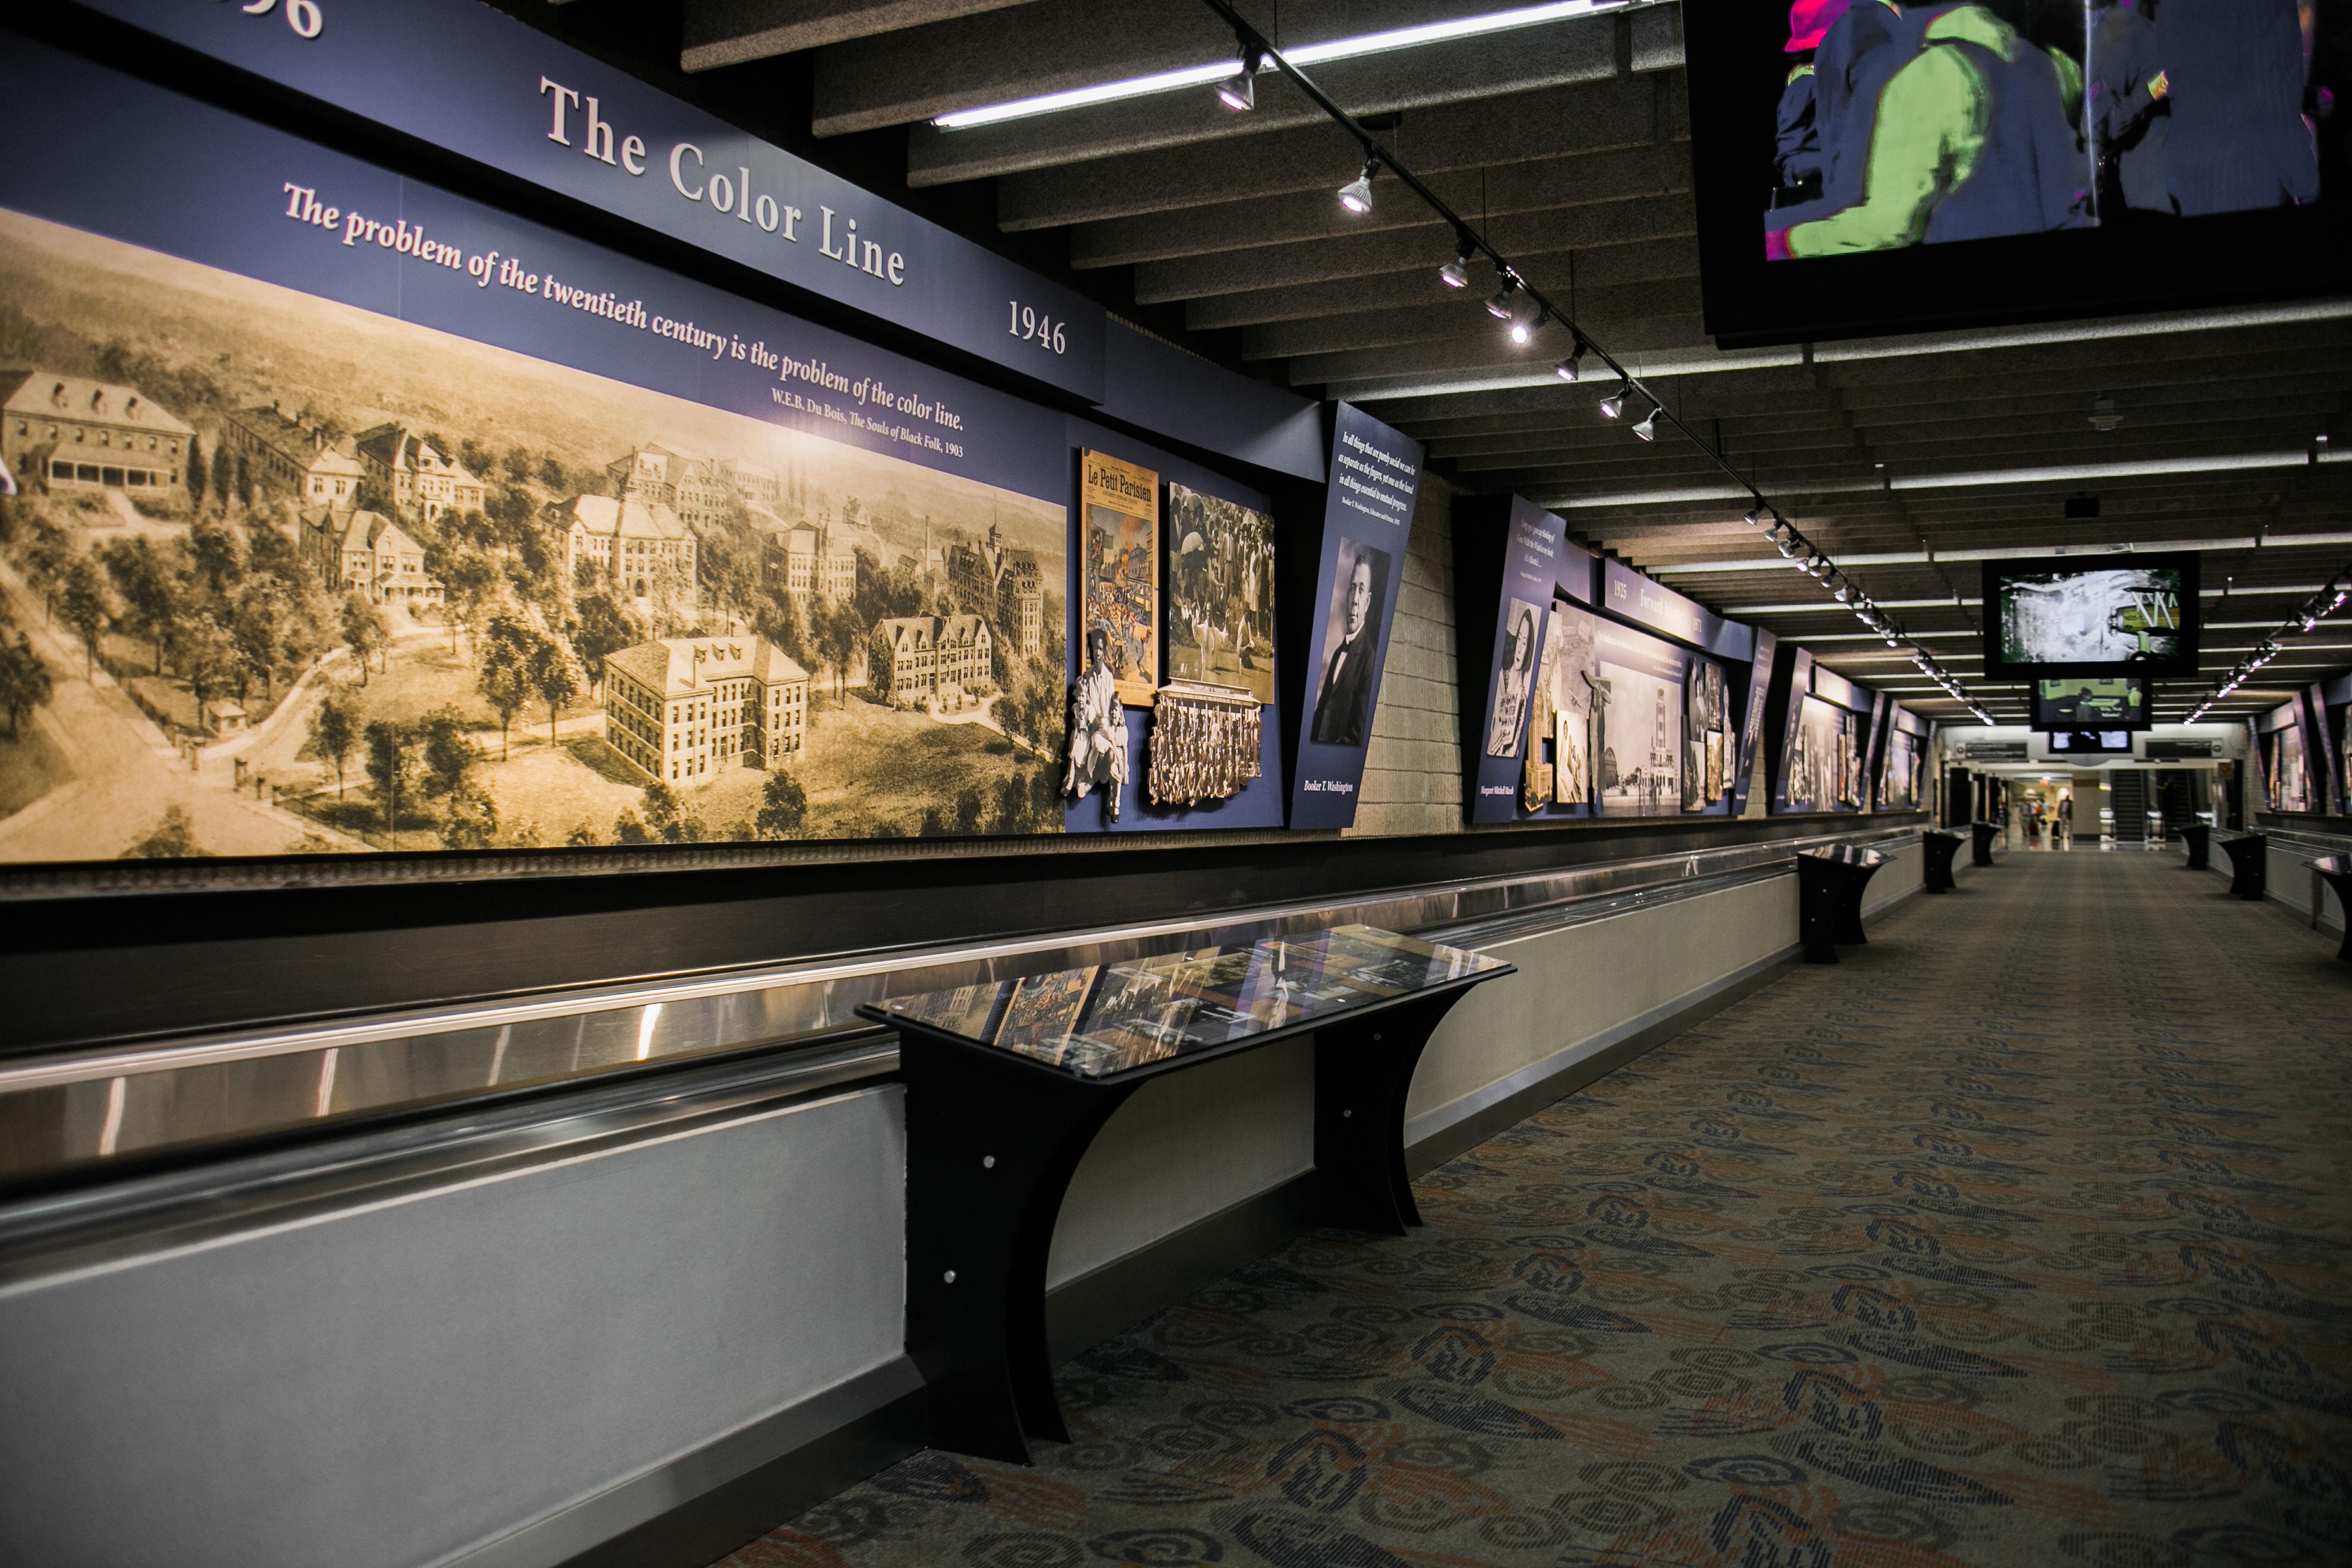 airport art program atl hartsfield jackson atlanta